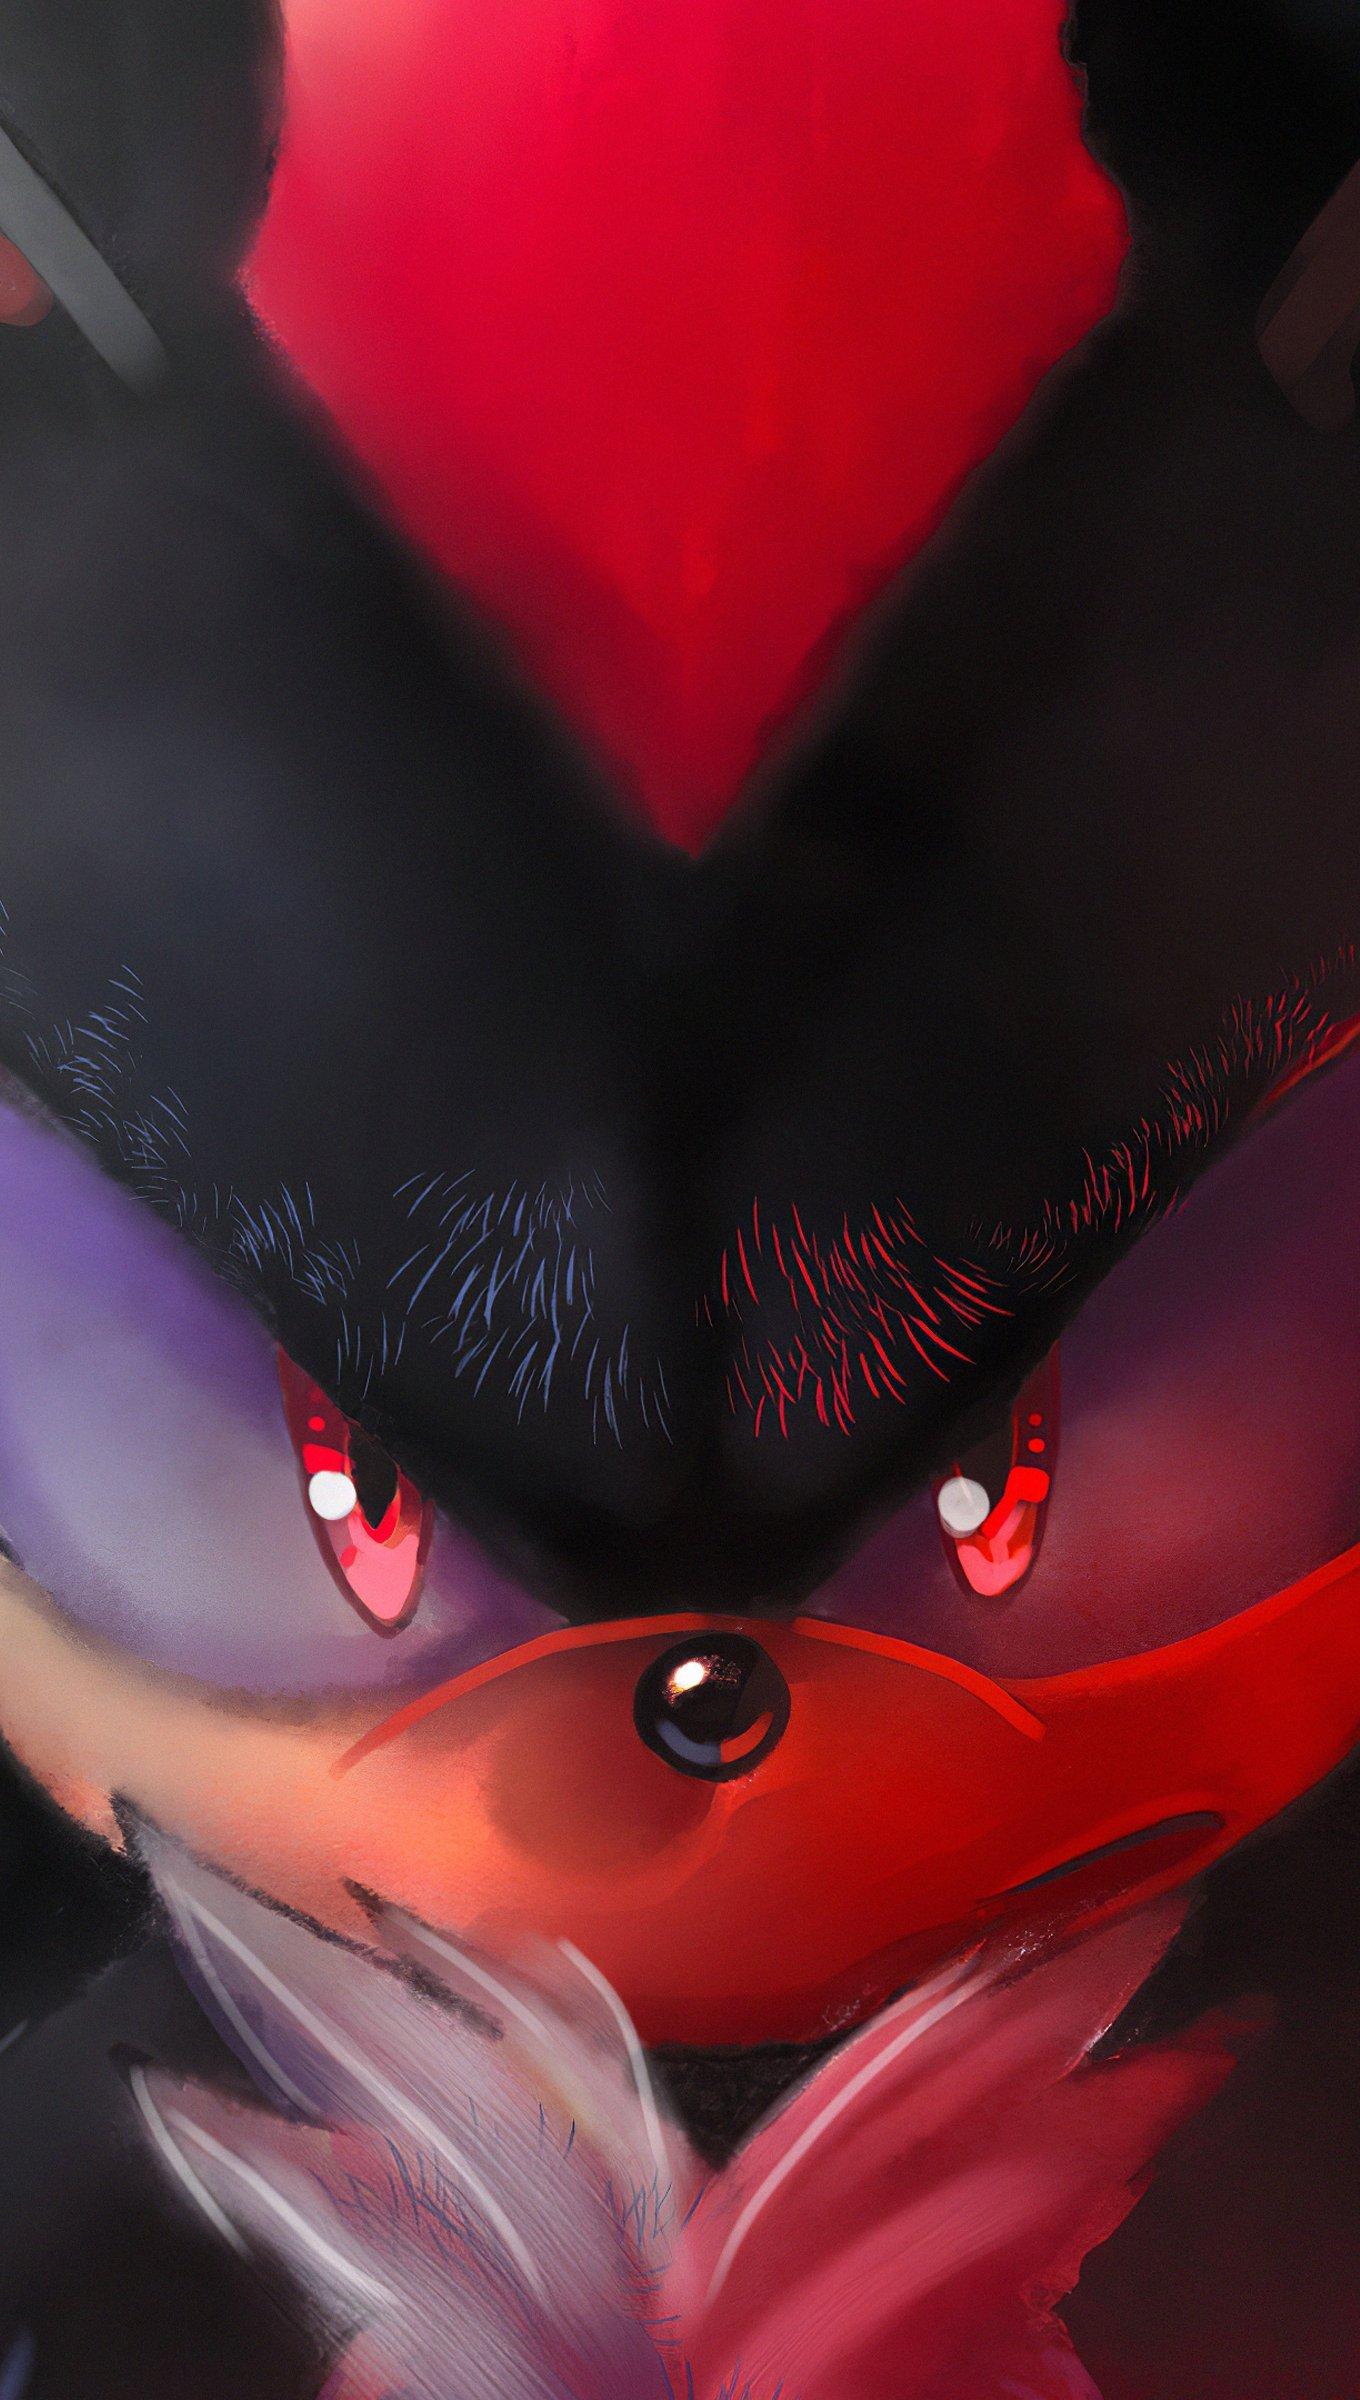 Fondos de pantalla Shadow the Hedgehog Vertical